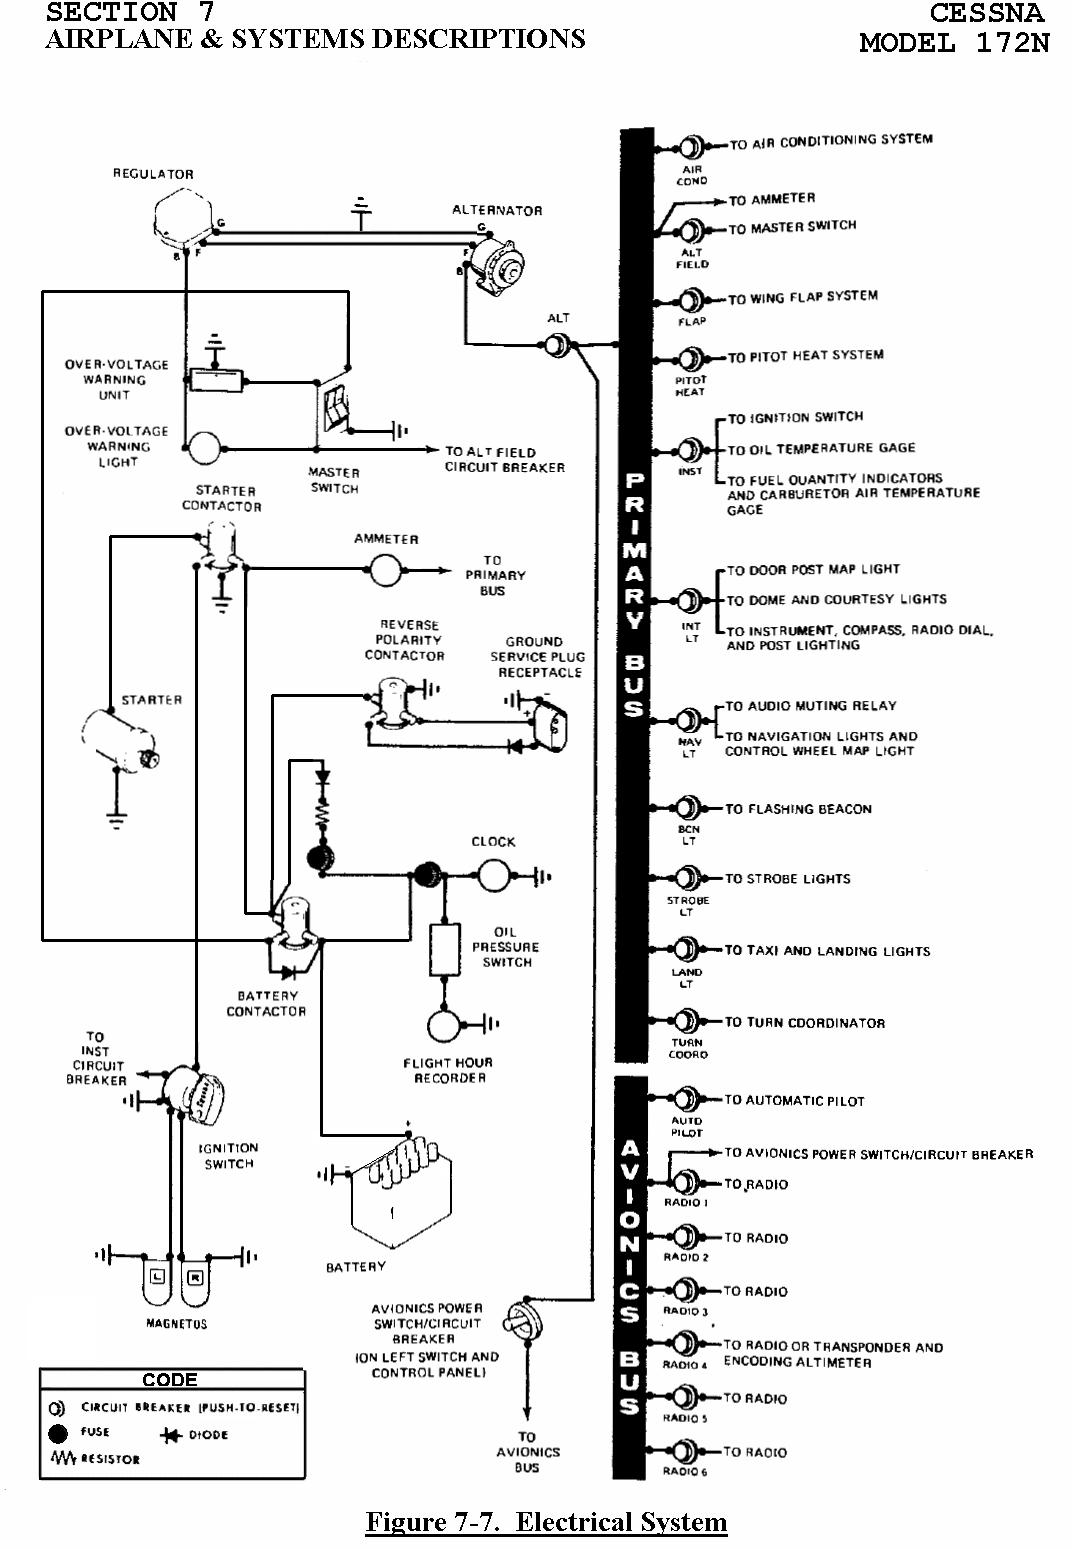 cessna 172n electrical system sistema electrico de la cessna 172n